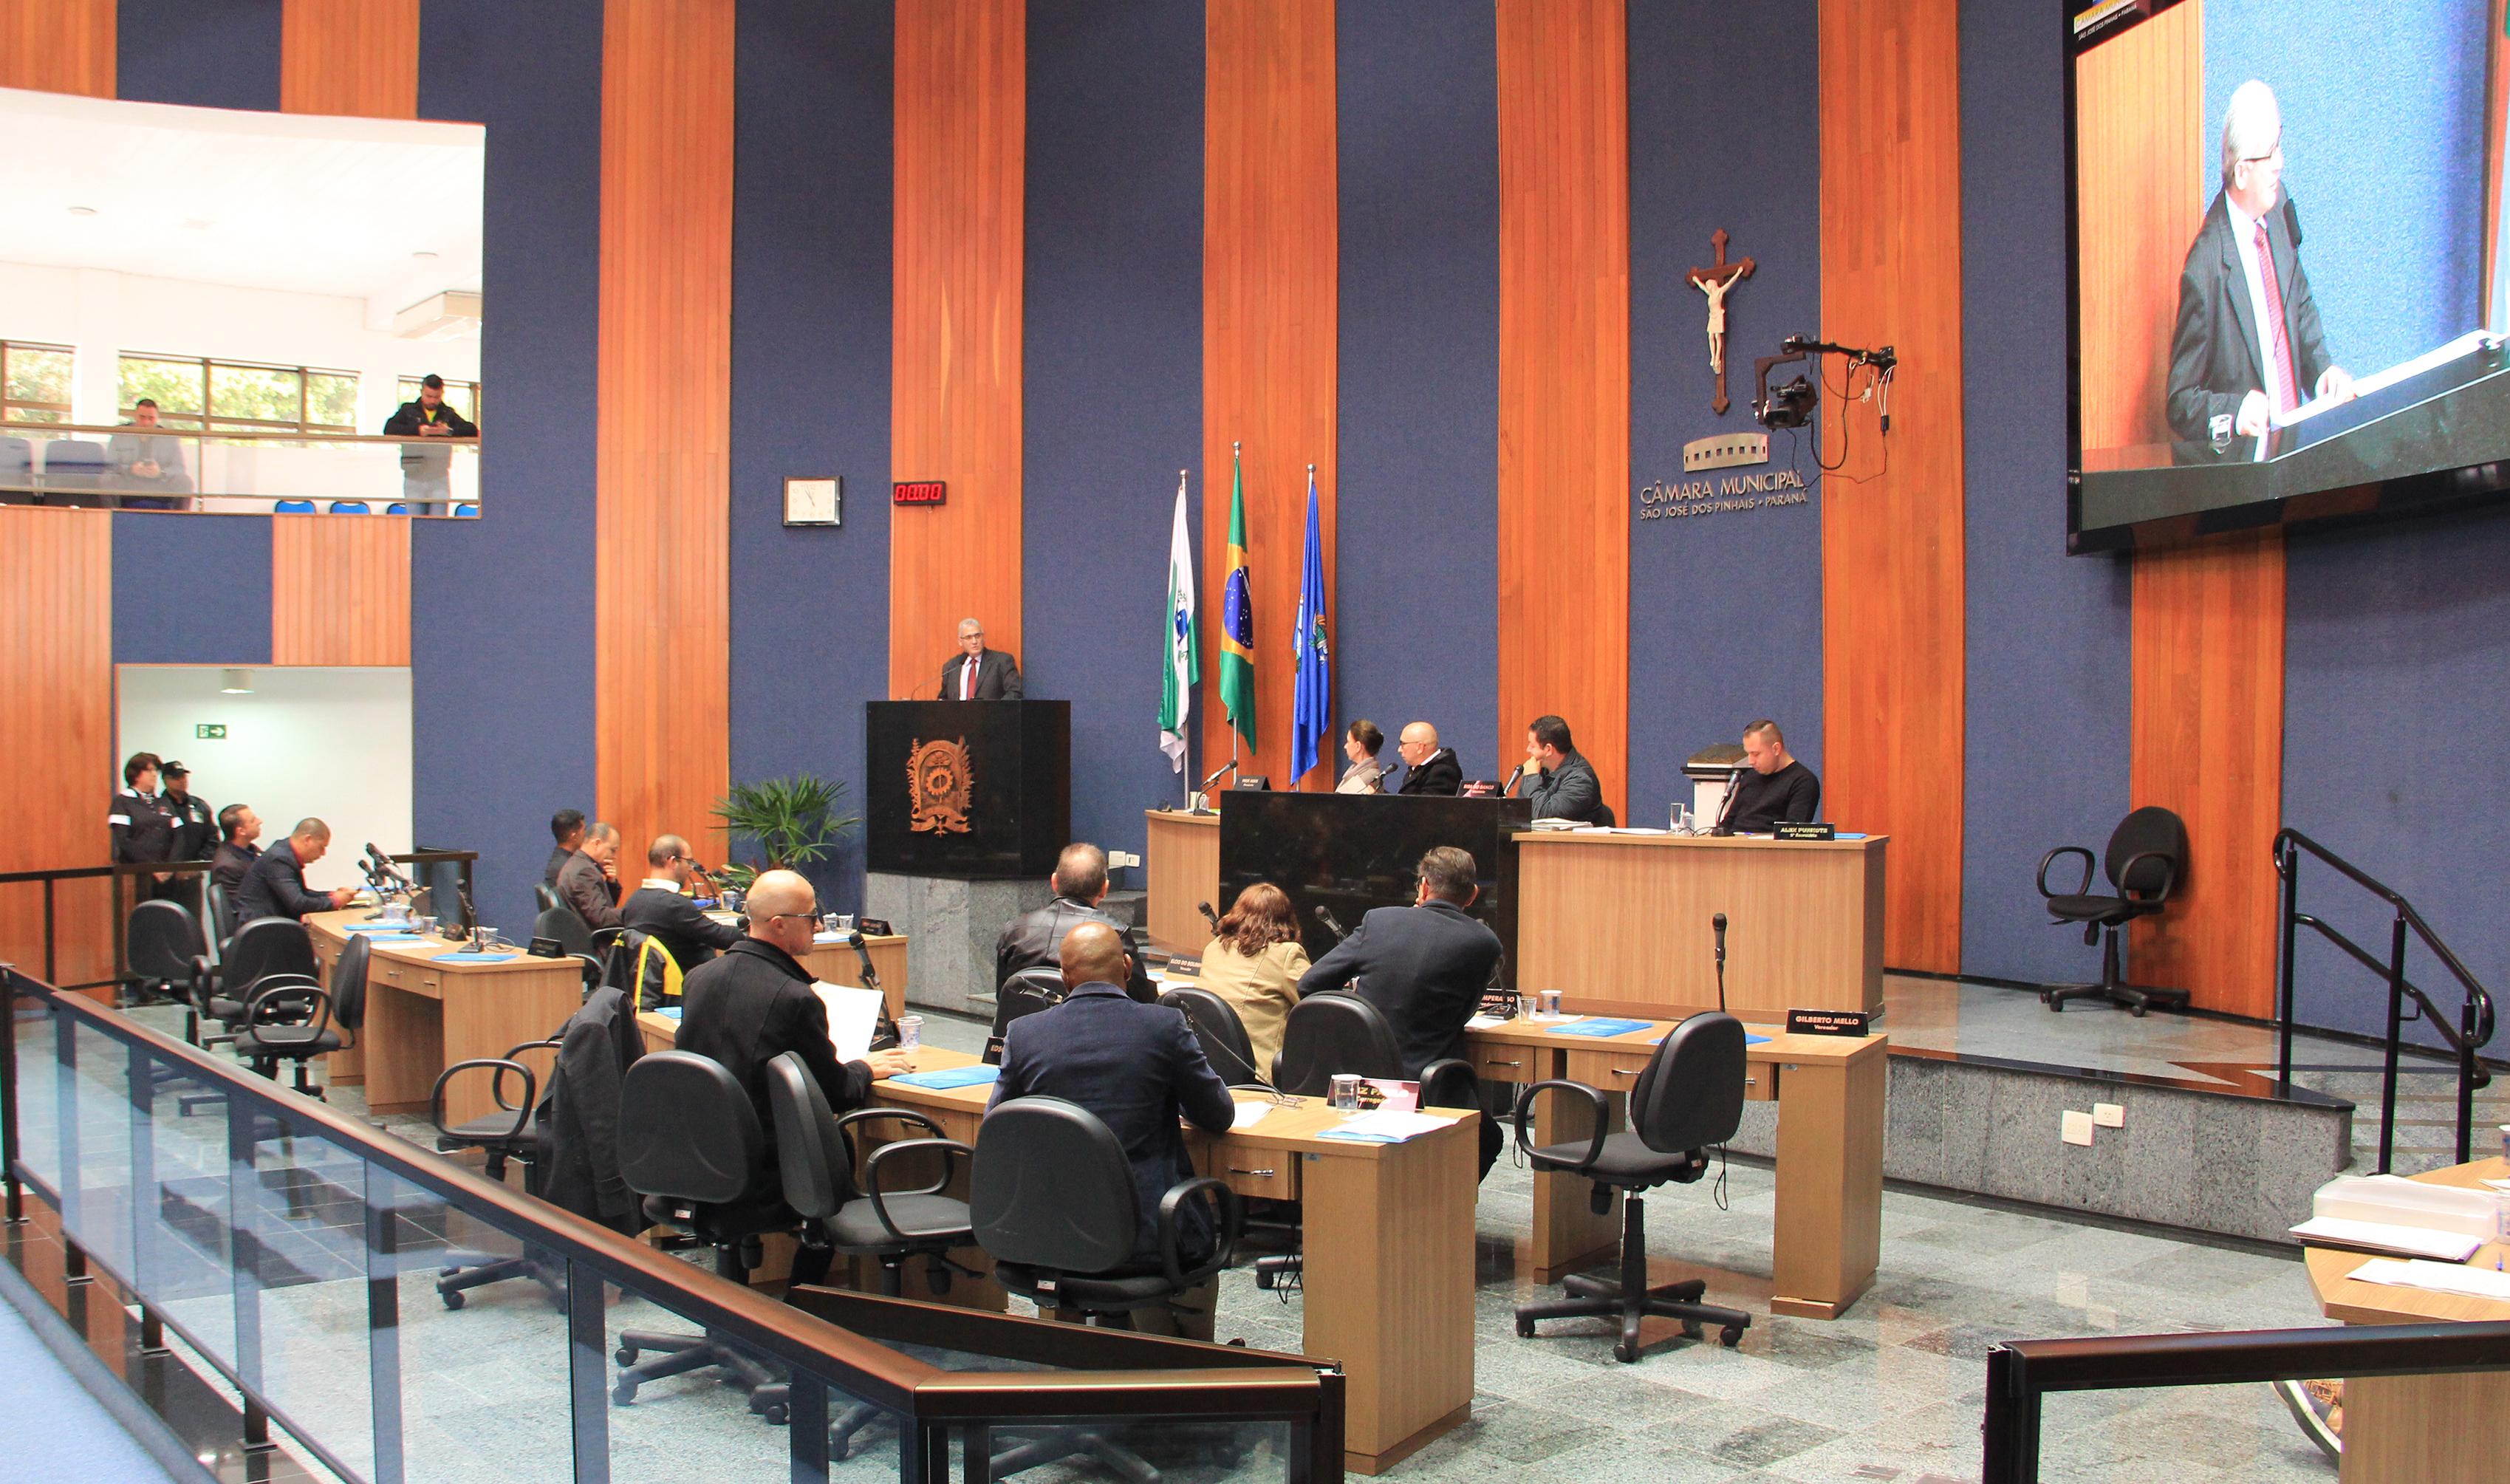 Vereadores recebem representante da Agepar para esclarecer dúvidas quanto as tarifas da Sanepar